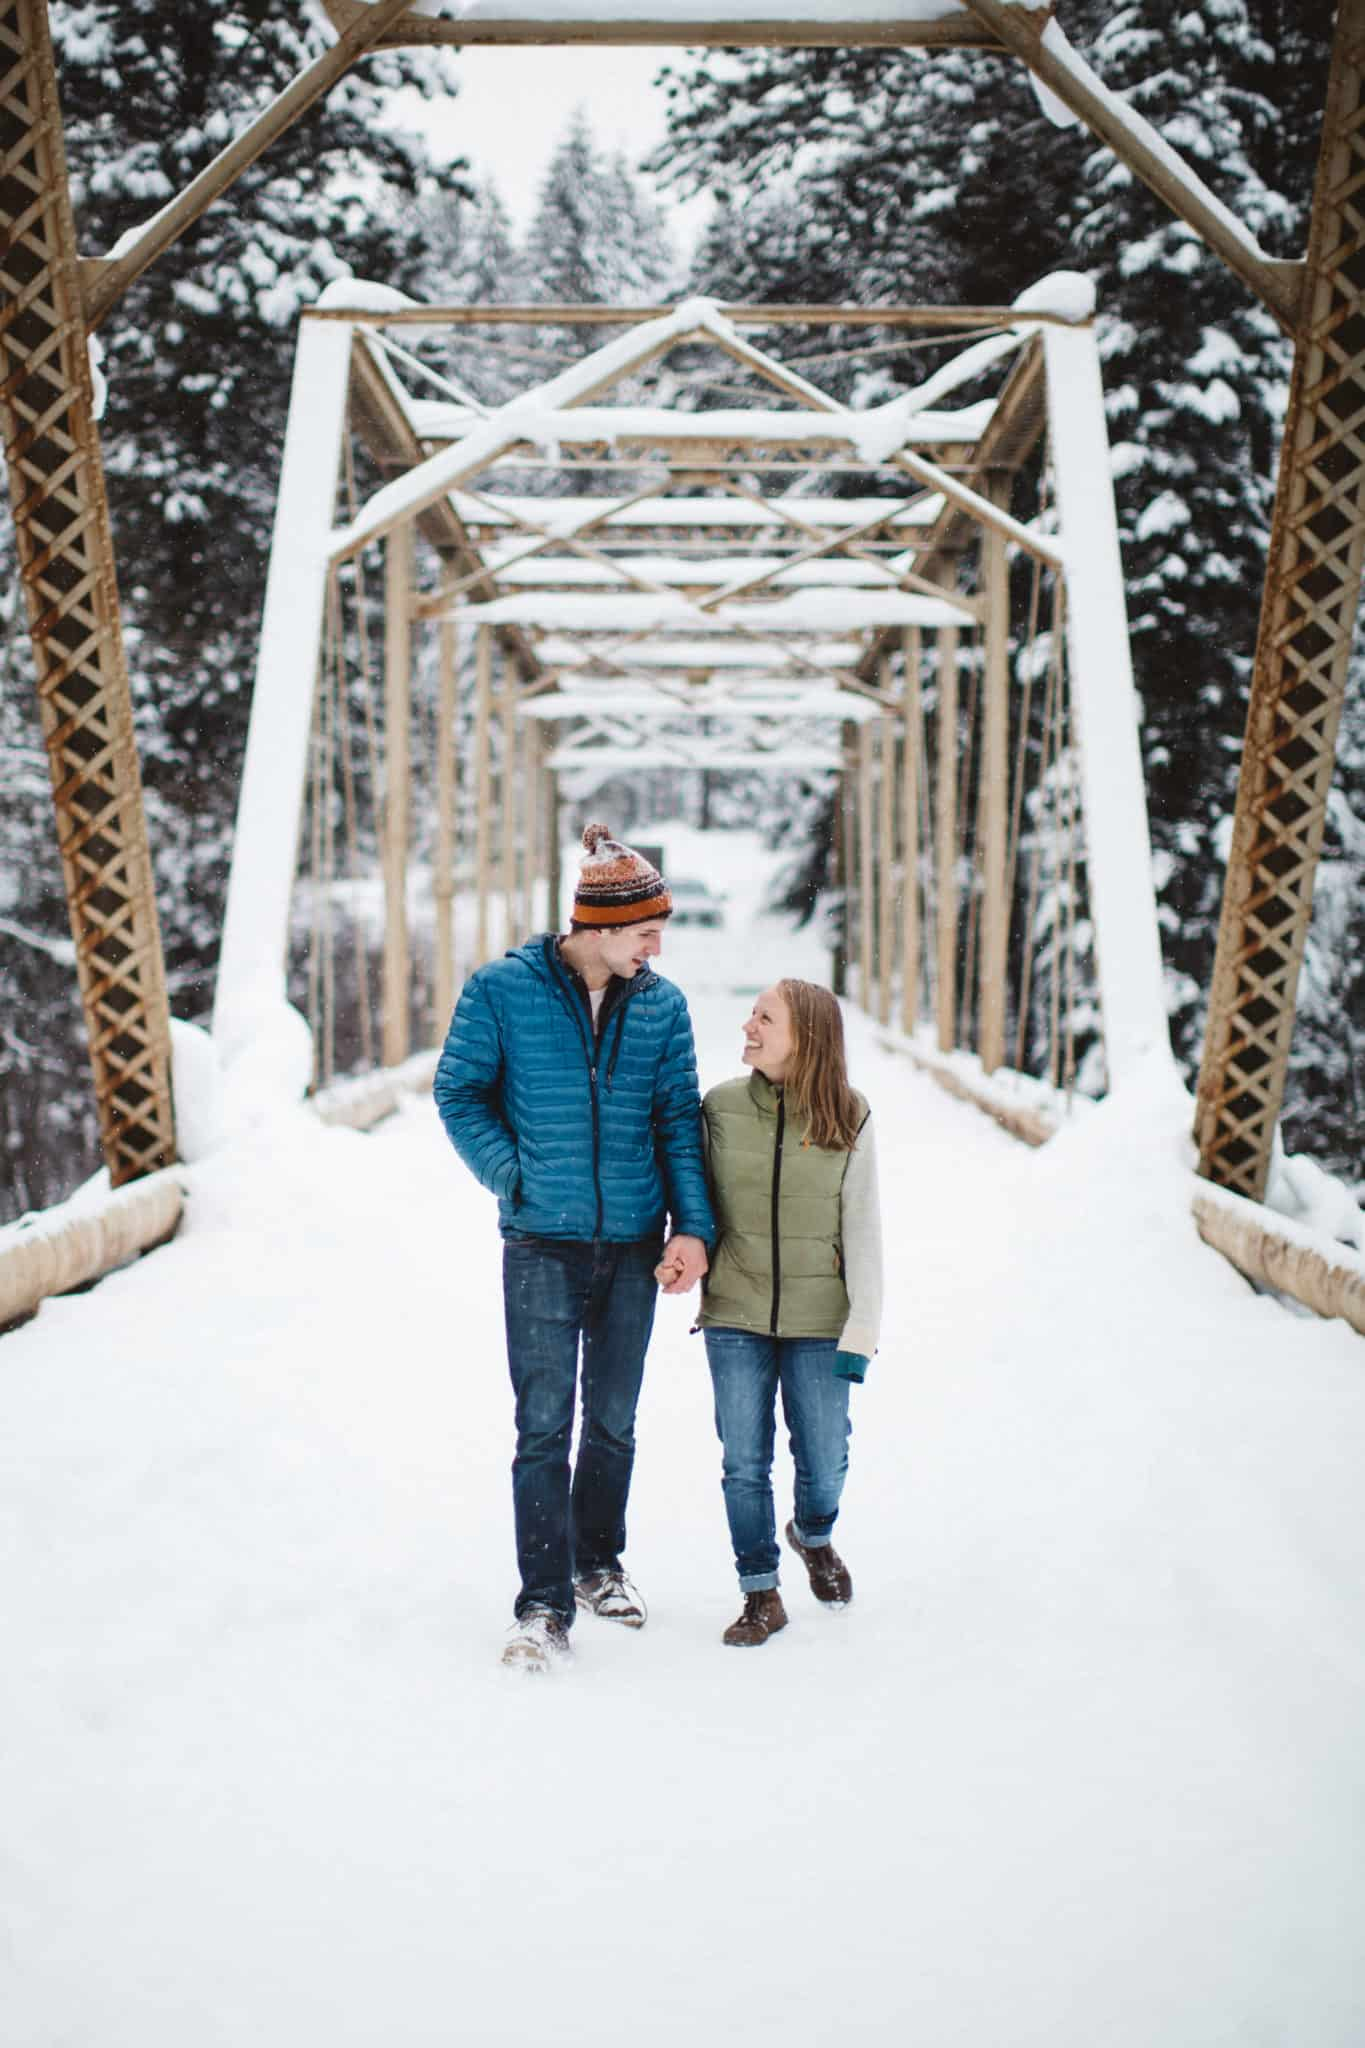 Leavenworth, Washington - PNW Engagement shoot locations - TheMandagies.com